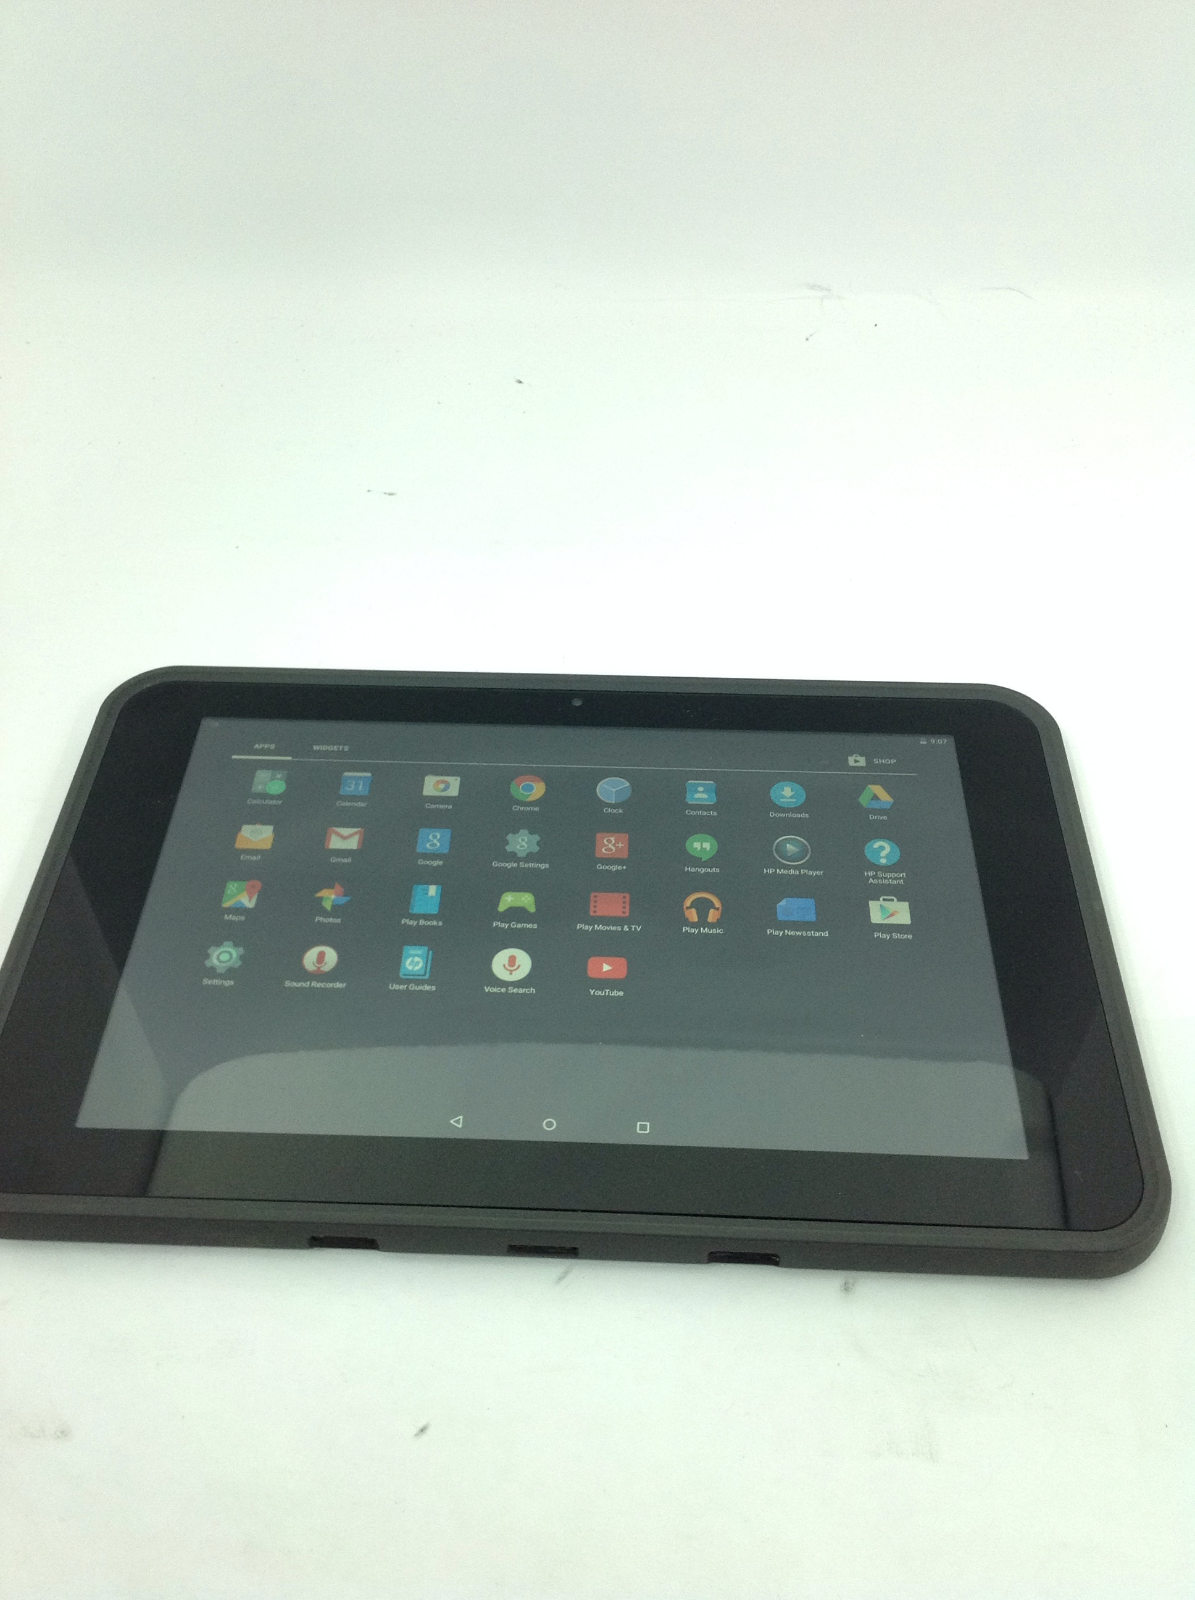 "HP ProSlate 10EEG1 Tablet 10.1"" Intel Atom 1.33GHz, 2GB RAM, 16GB (BAD CAMERA)"